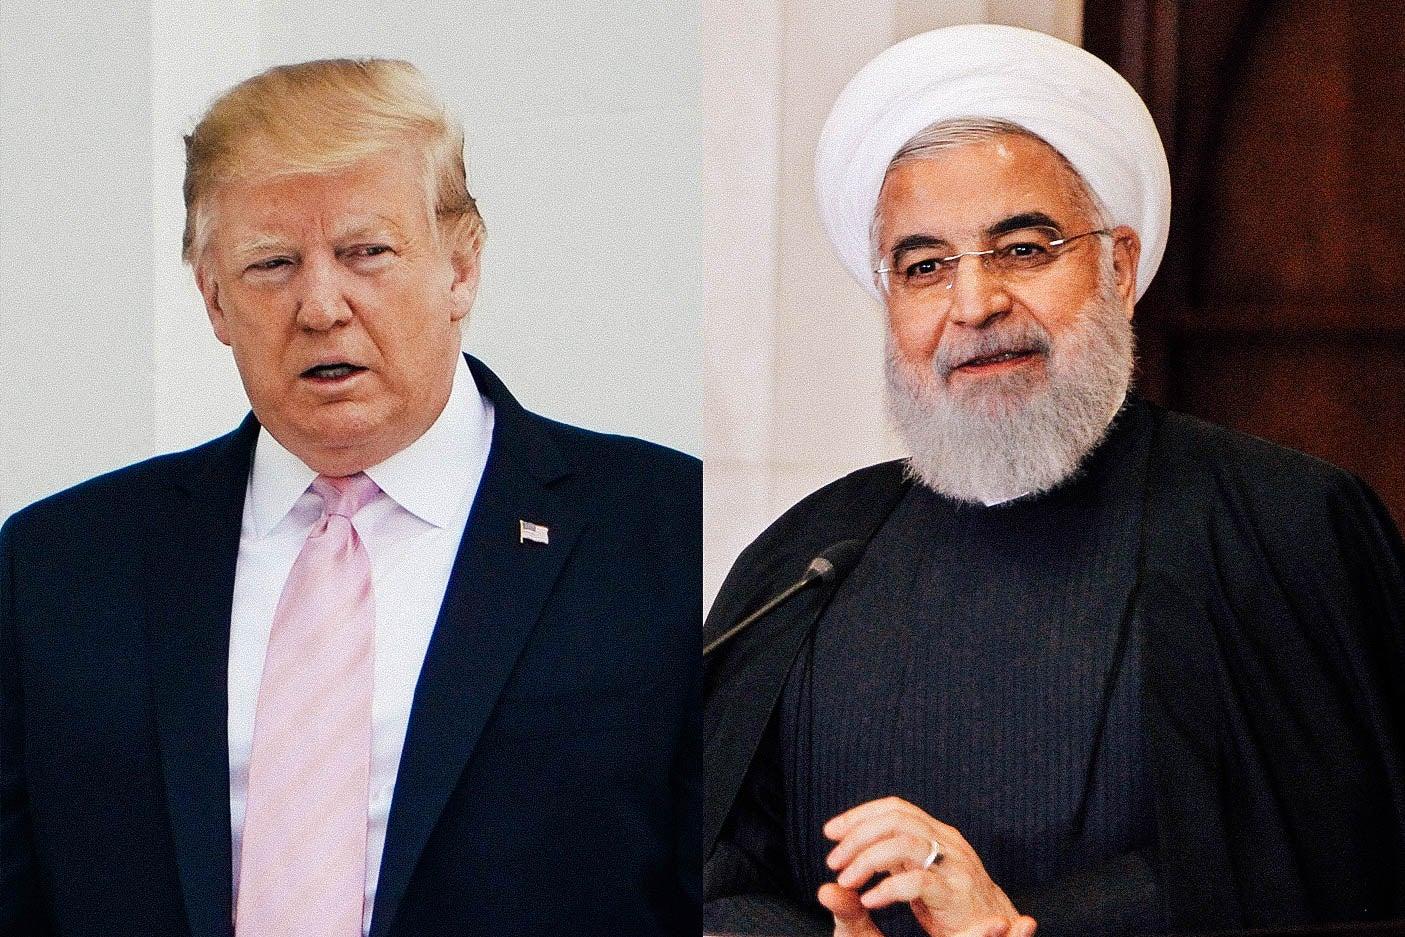 U.S. President Donald Trump and Iranian President Hassan Rouhani.